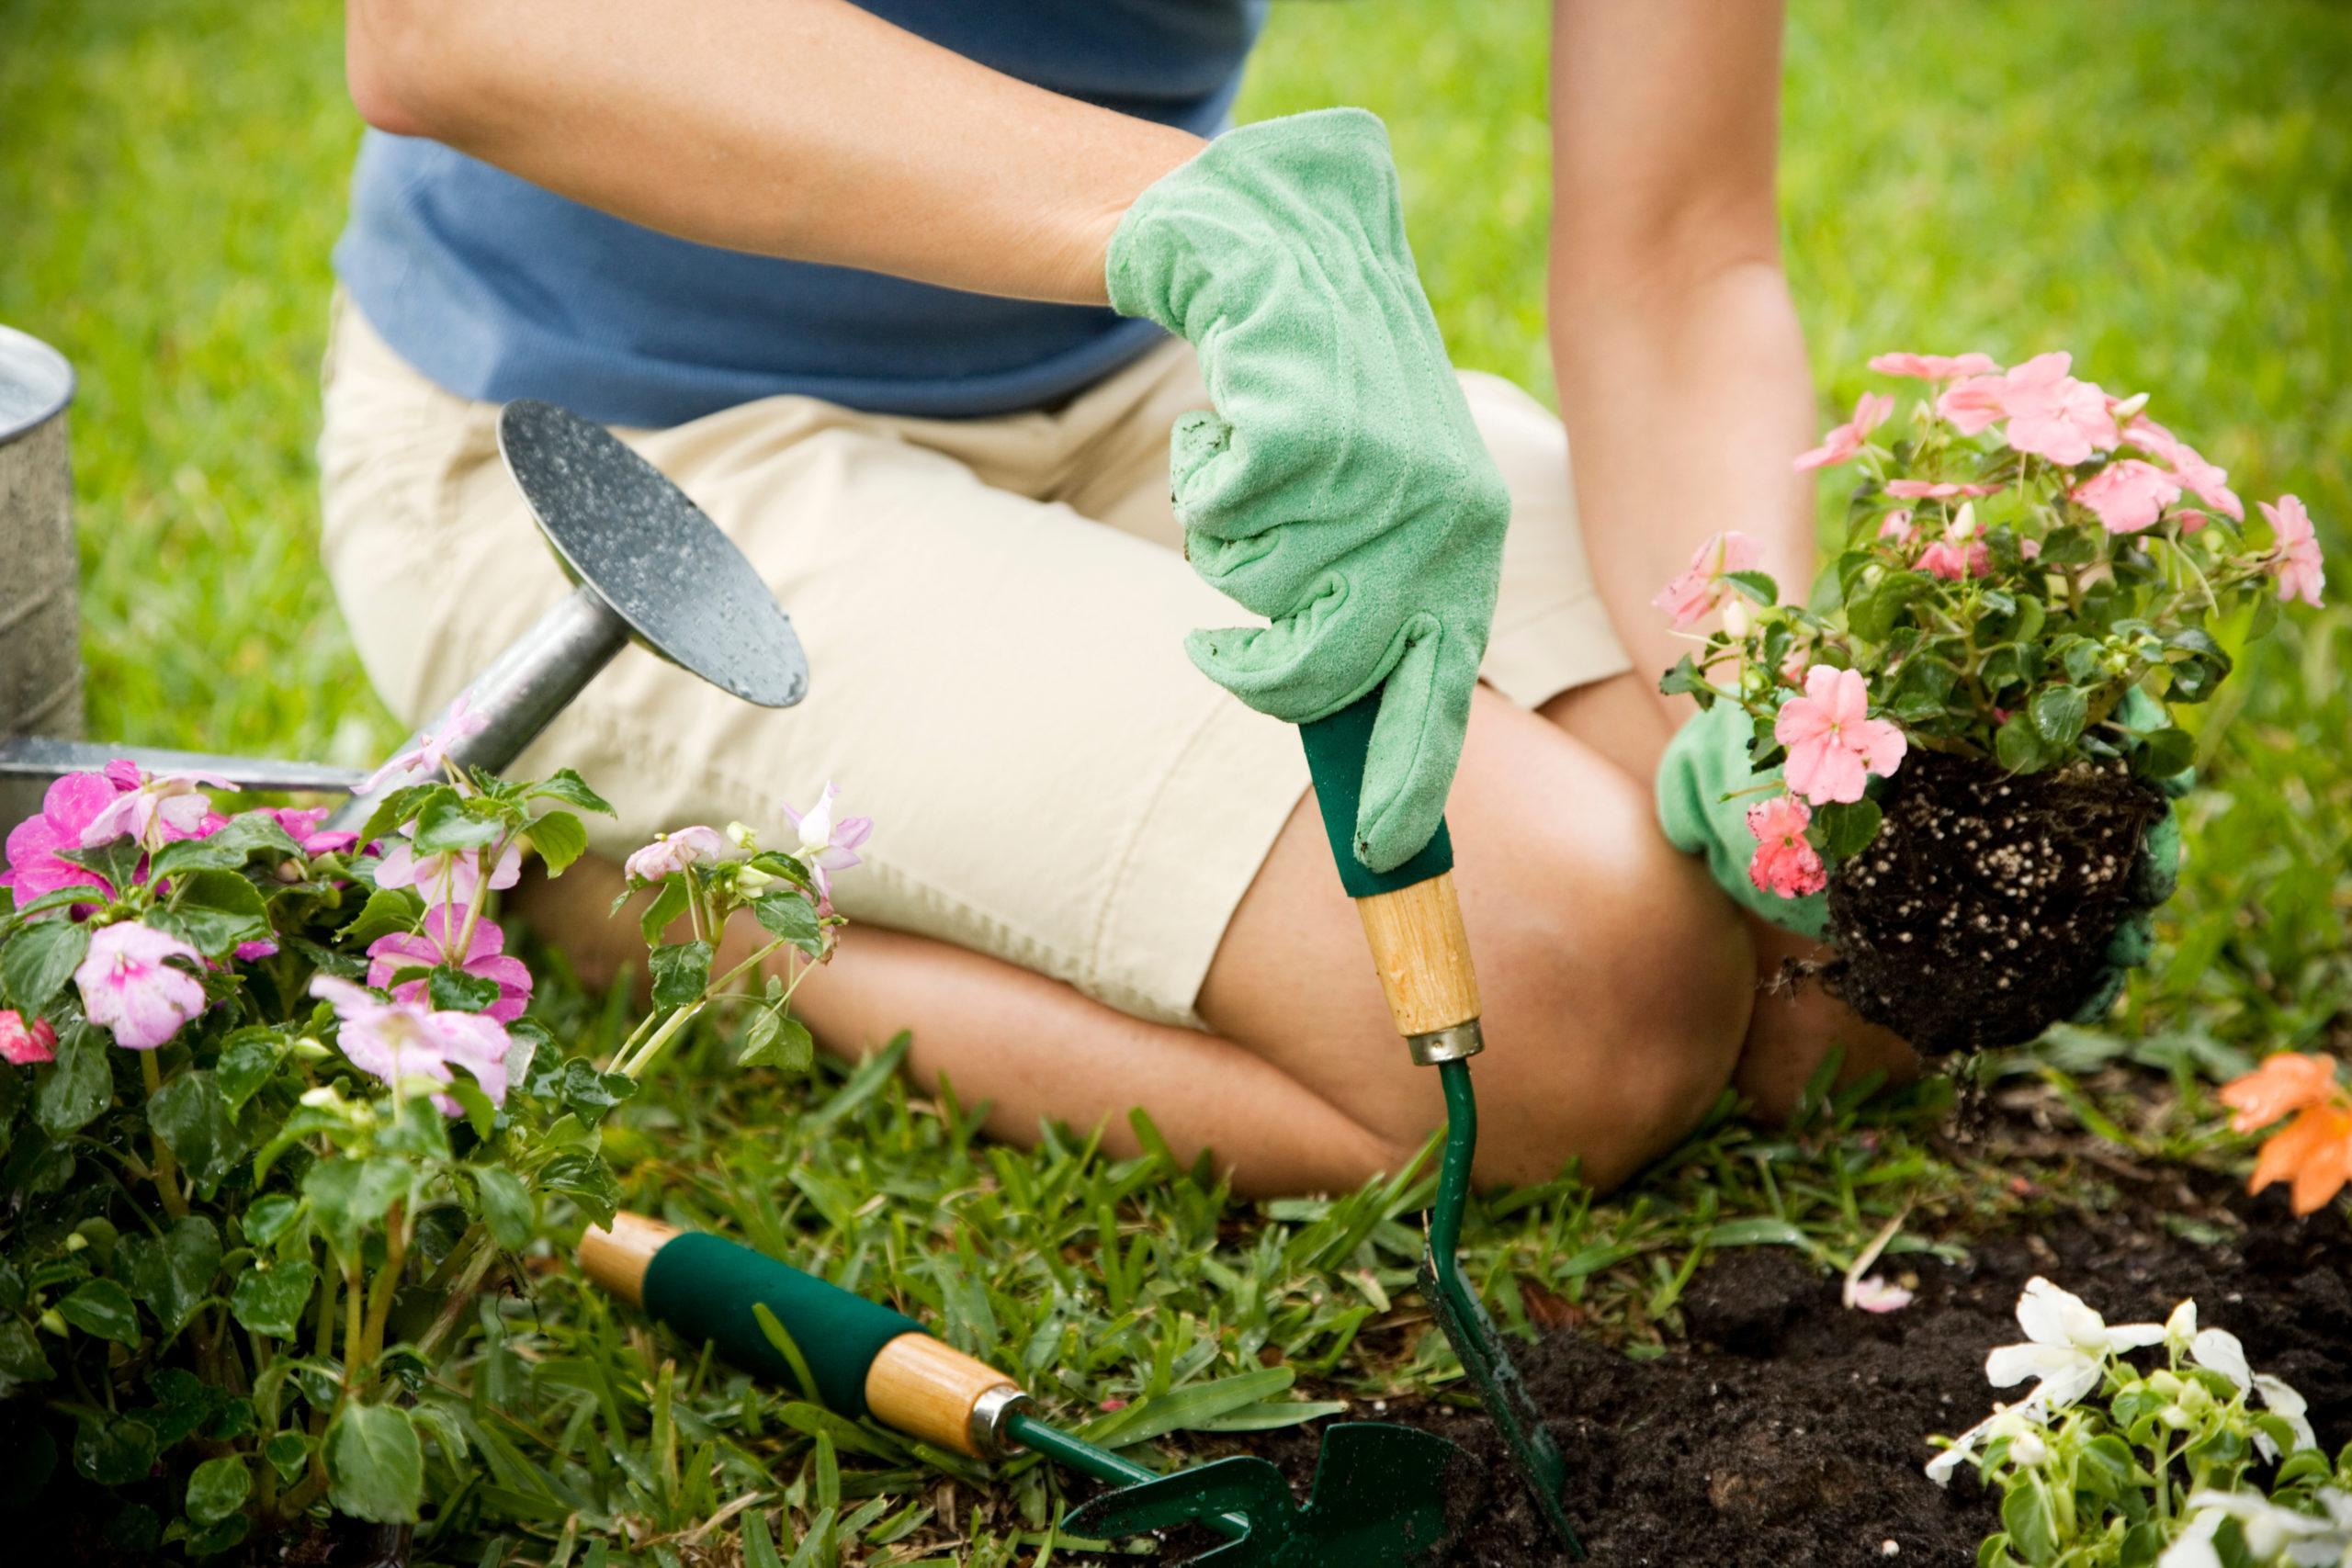 Woman works on her garden